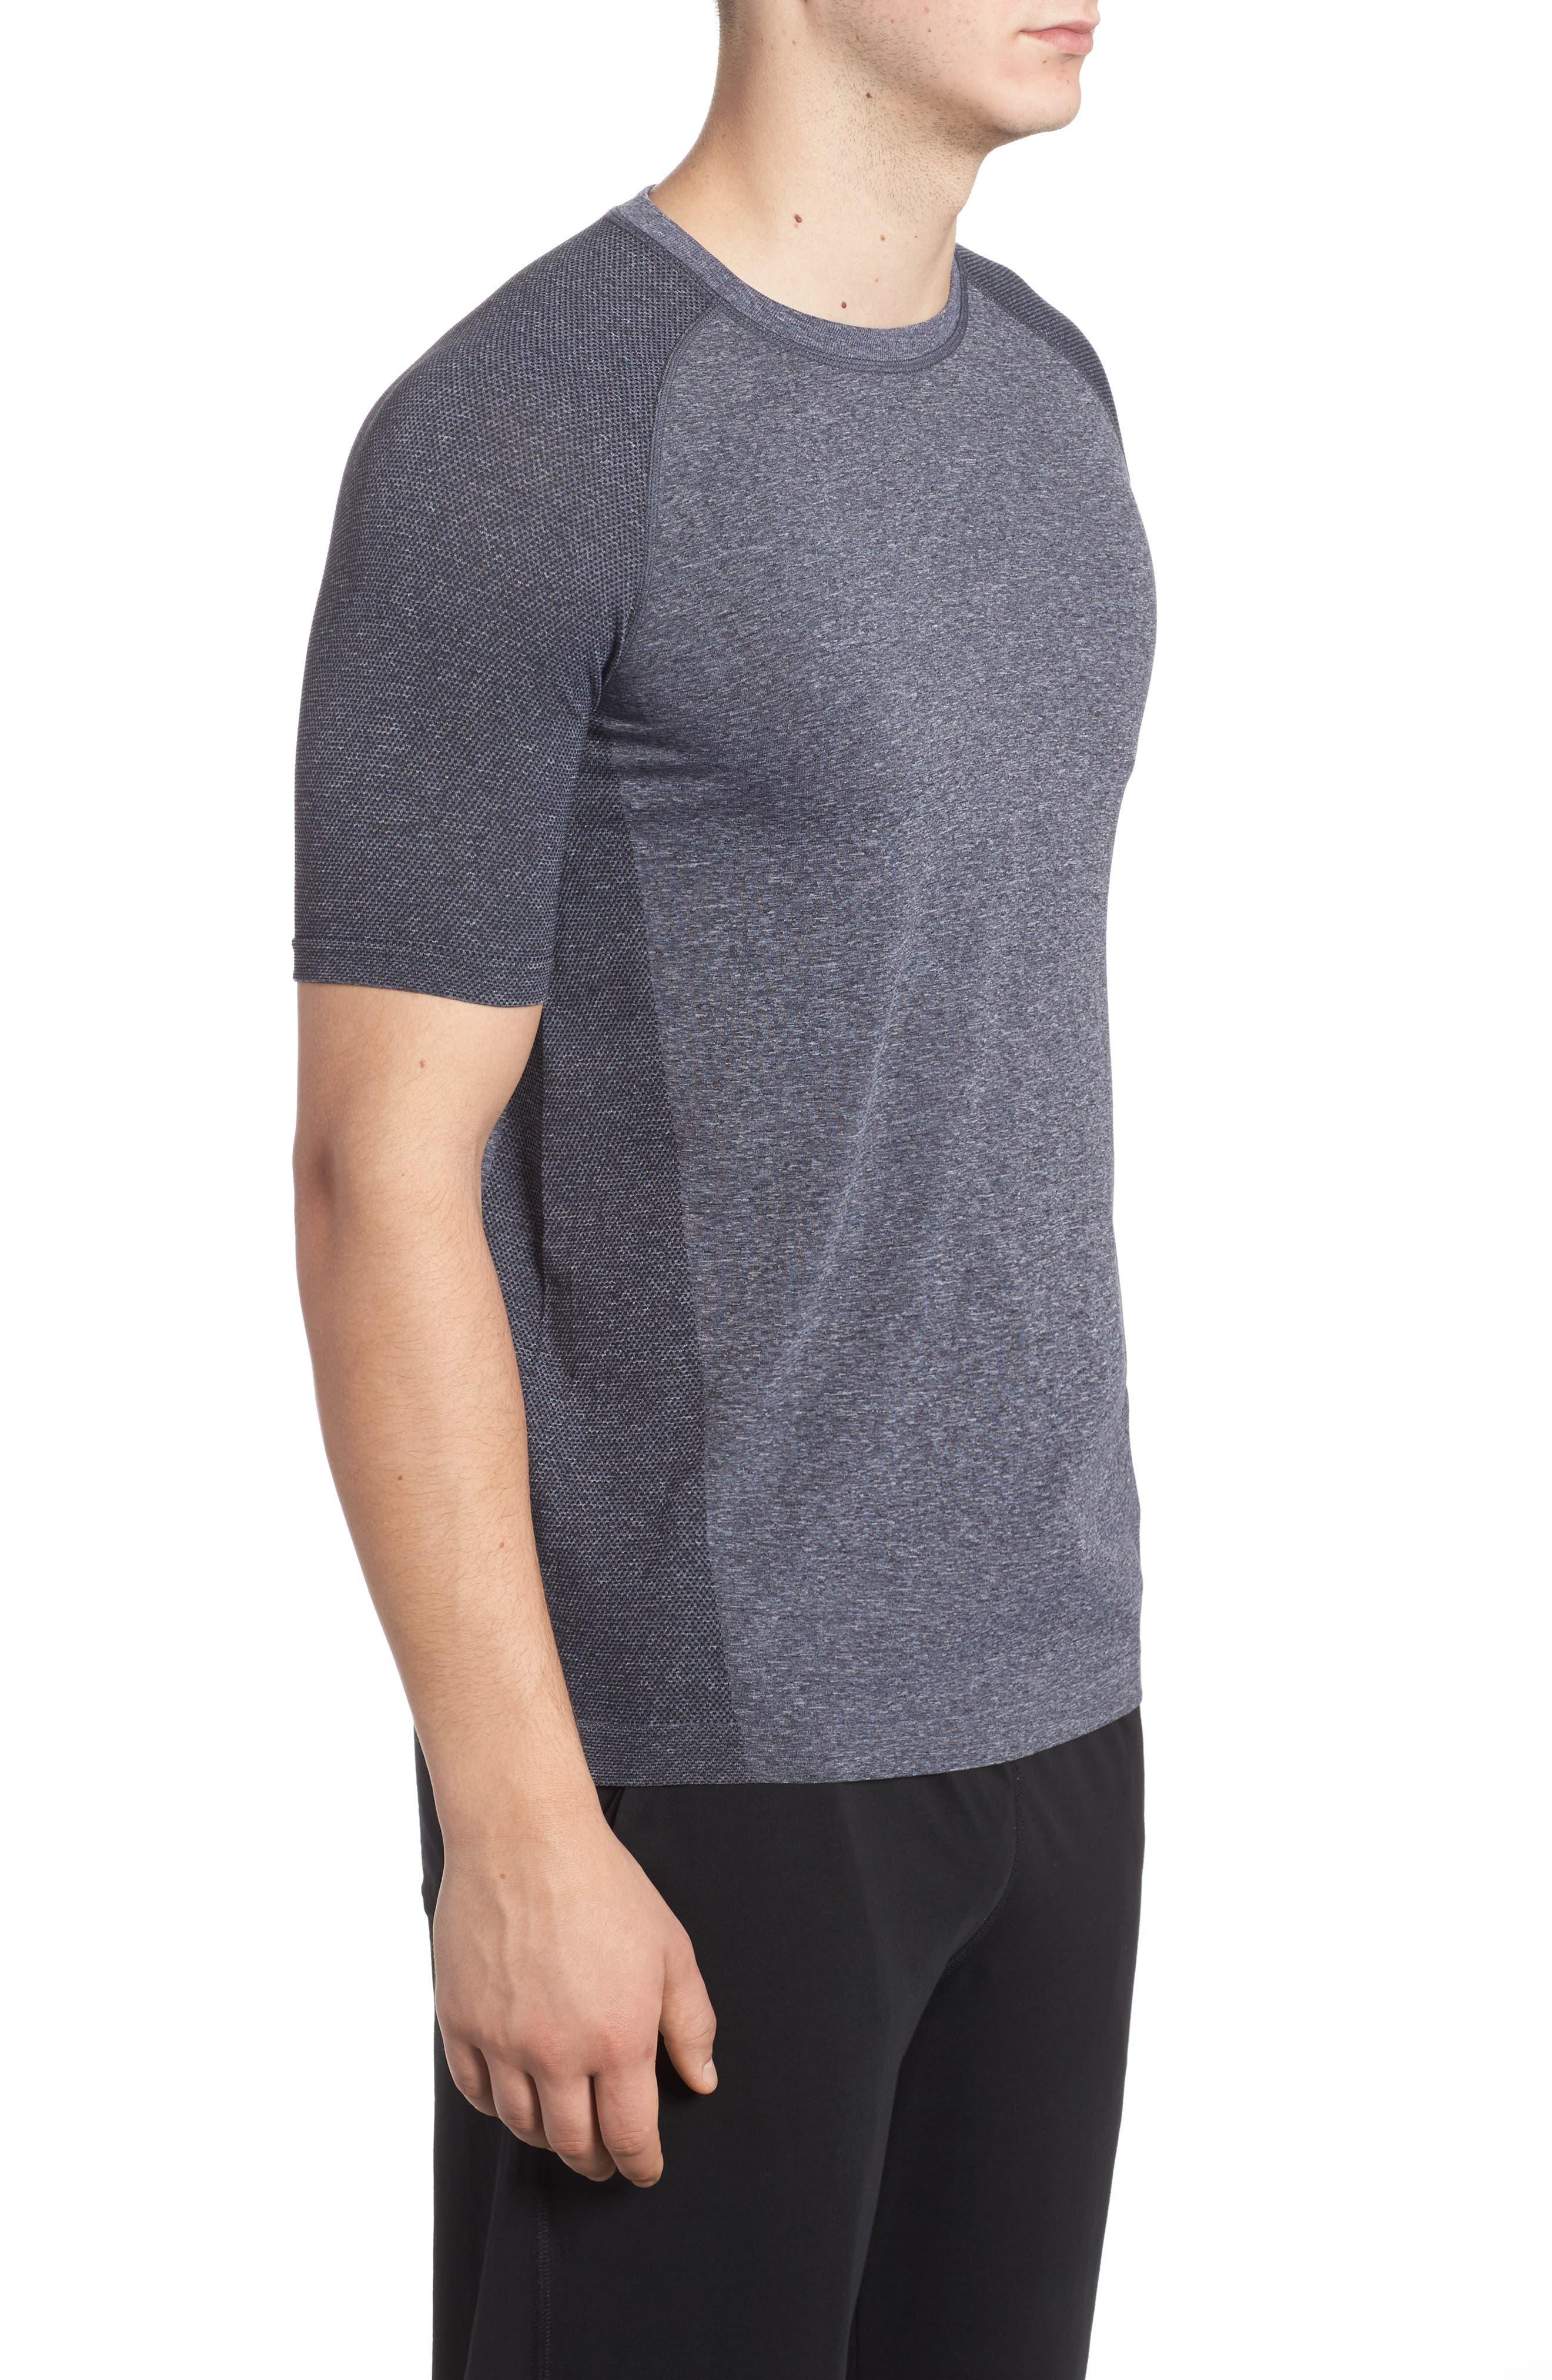 Vapor Performance T-Shirt,                             Alternate thumbnail 3, color,                             ASPHALT